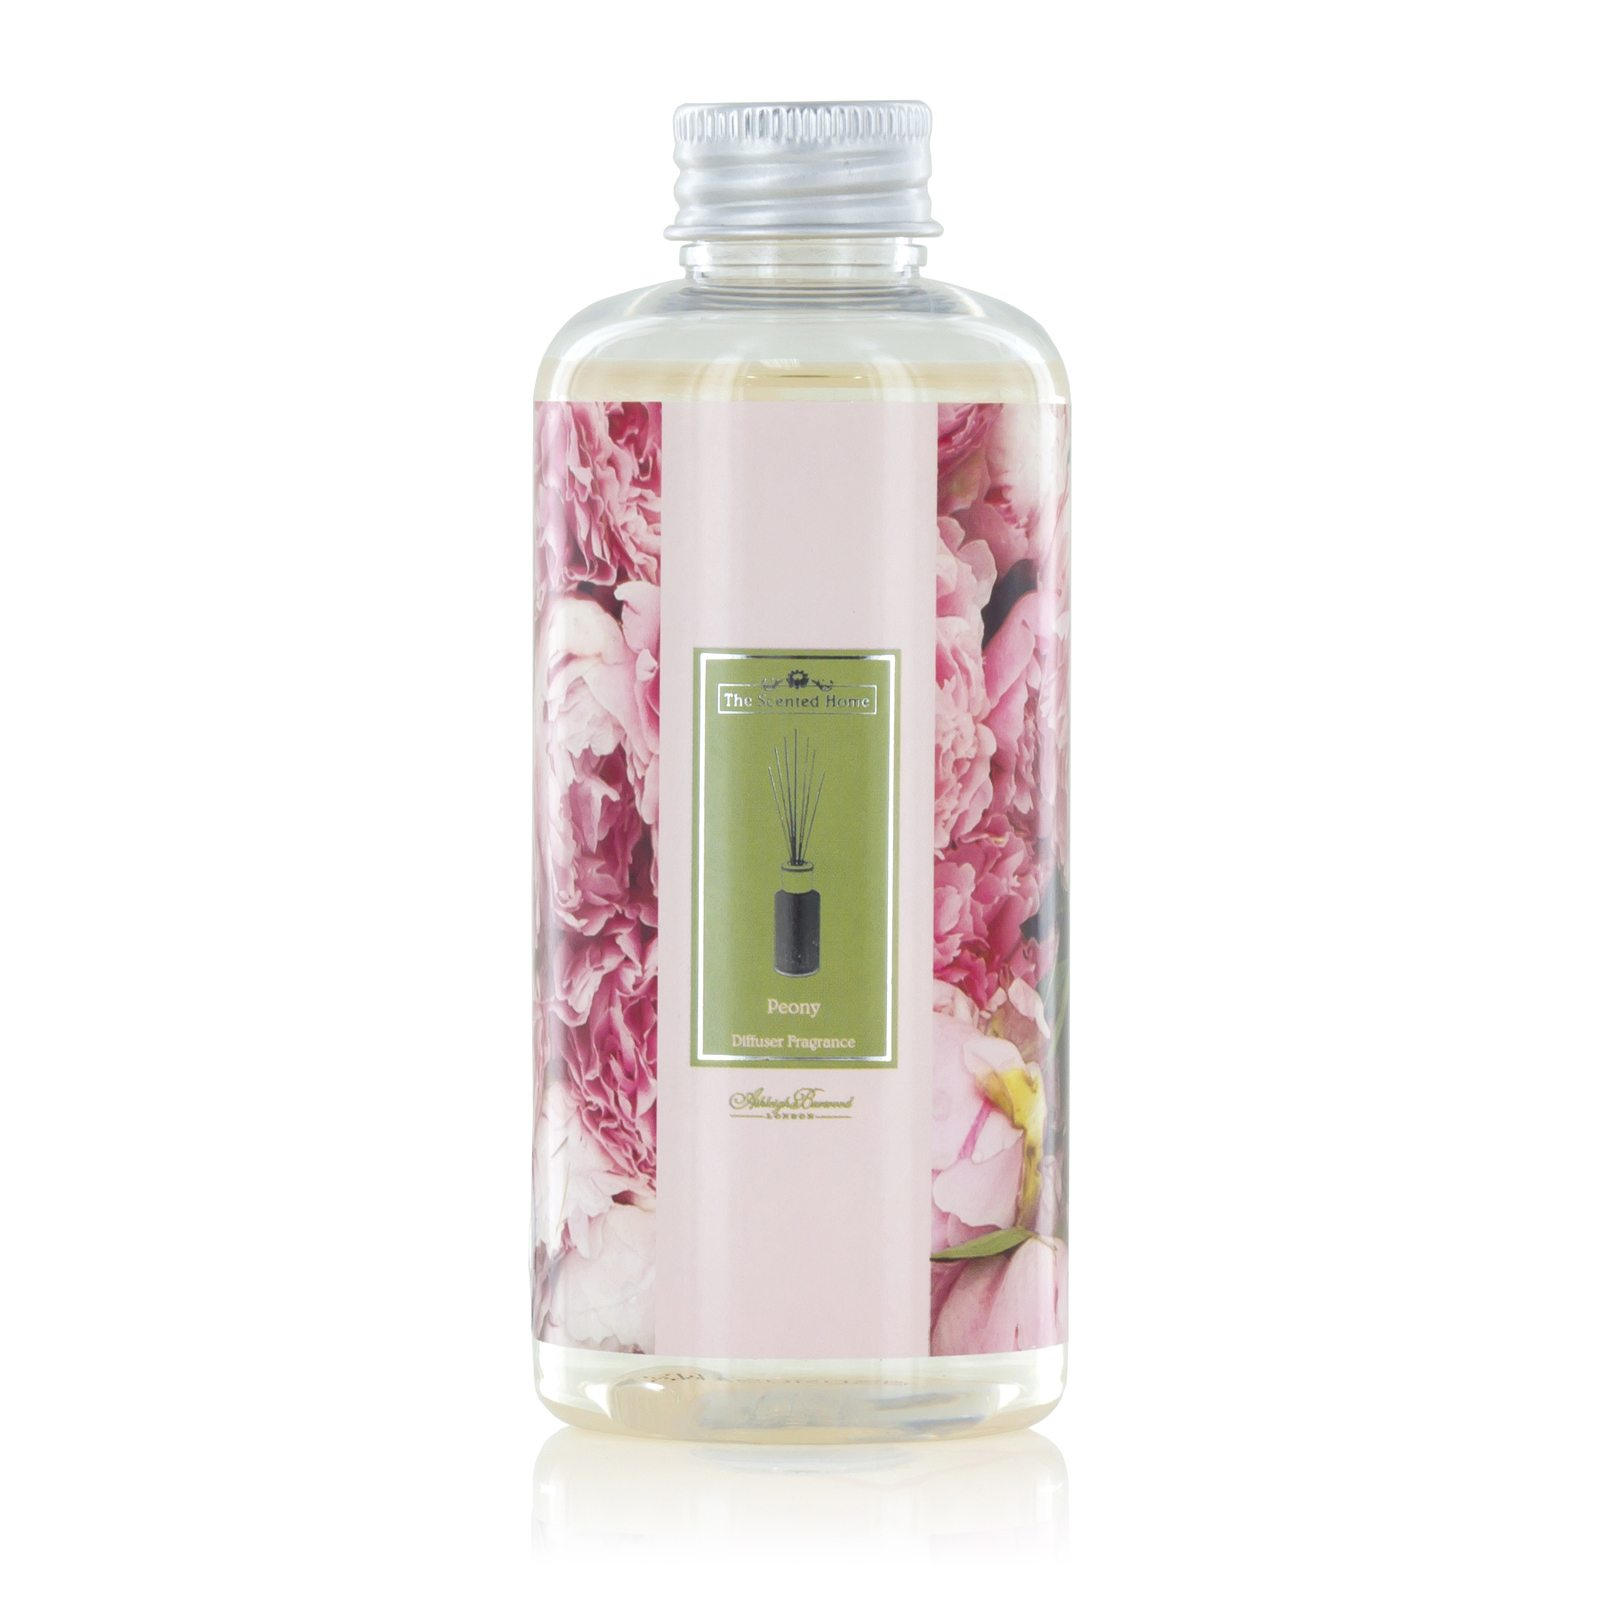 Ashleigh & Burwood Diffuser Fragrance Refill – Peony